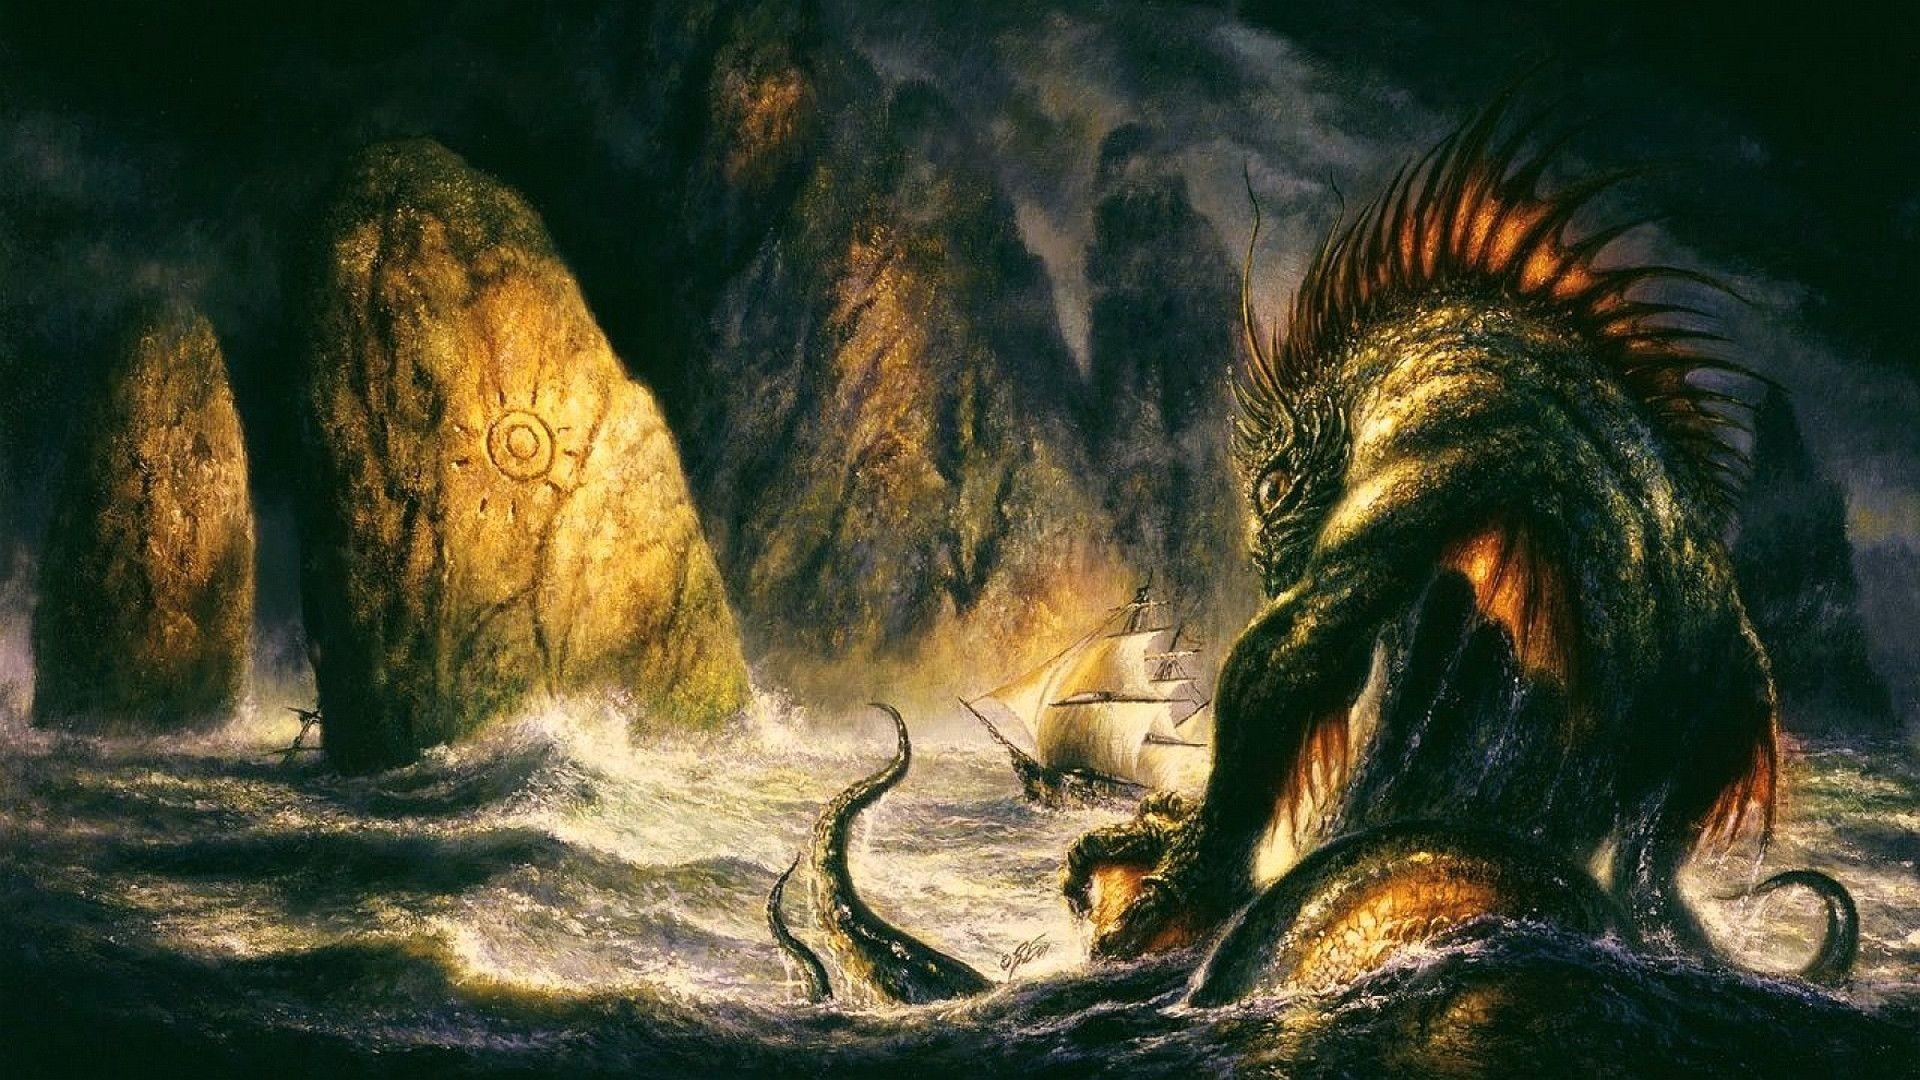 Lovecraft Wallpapers